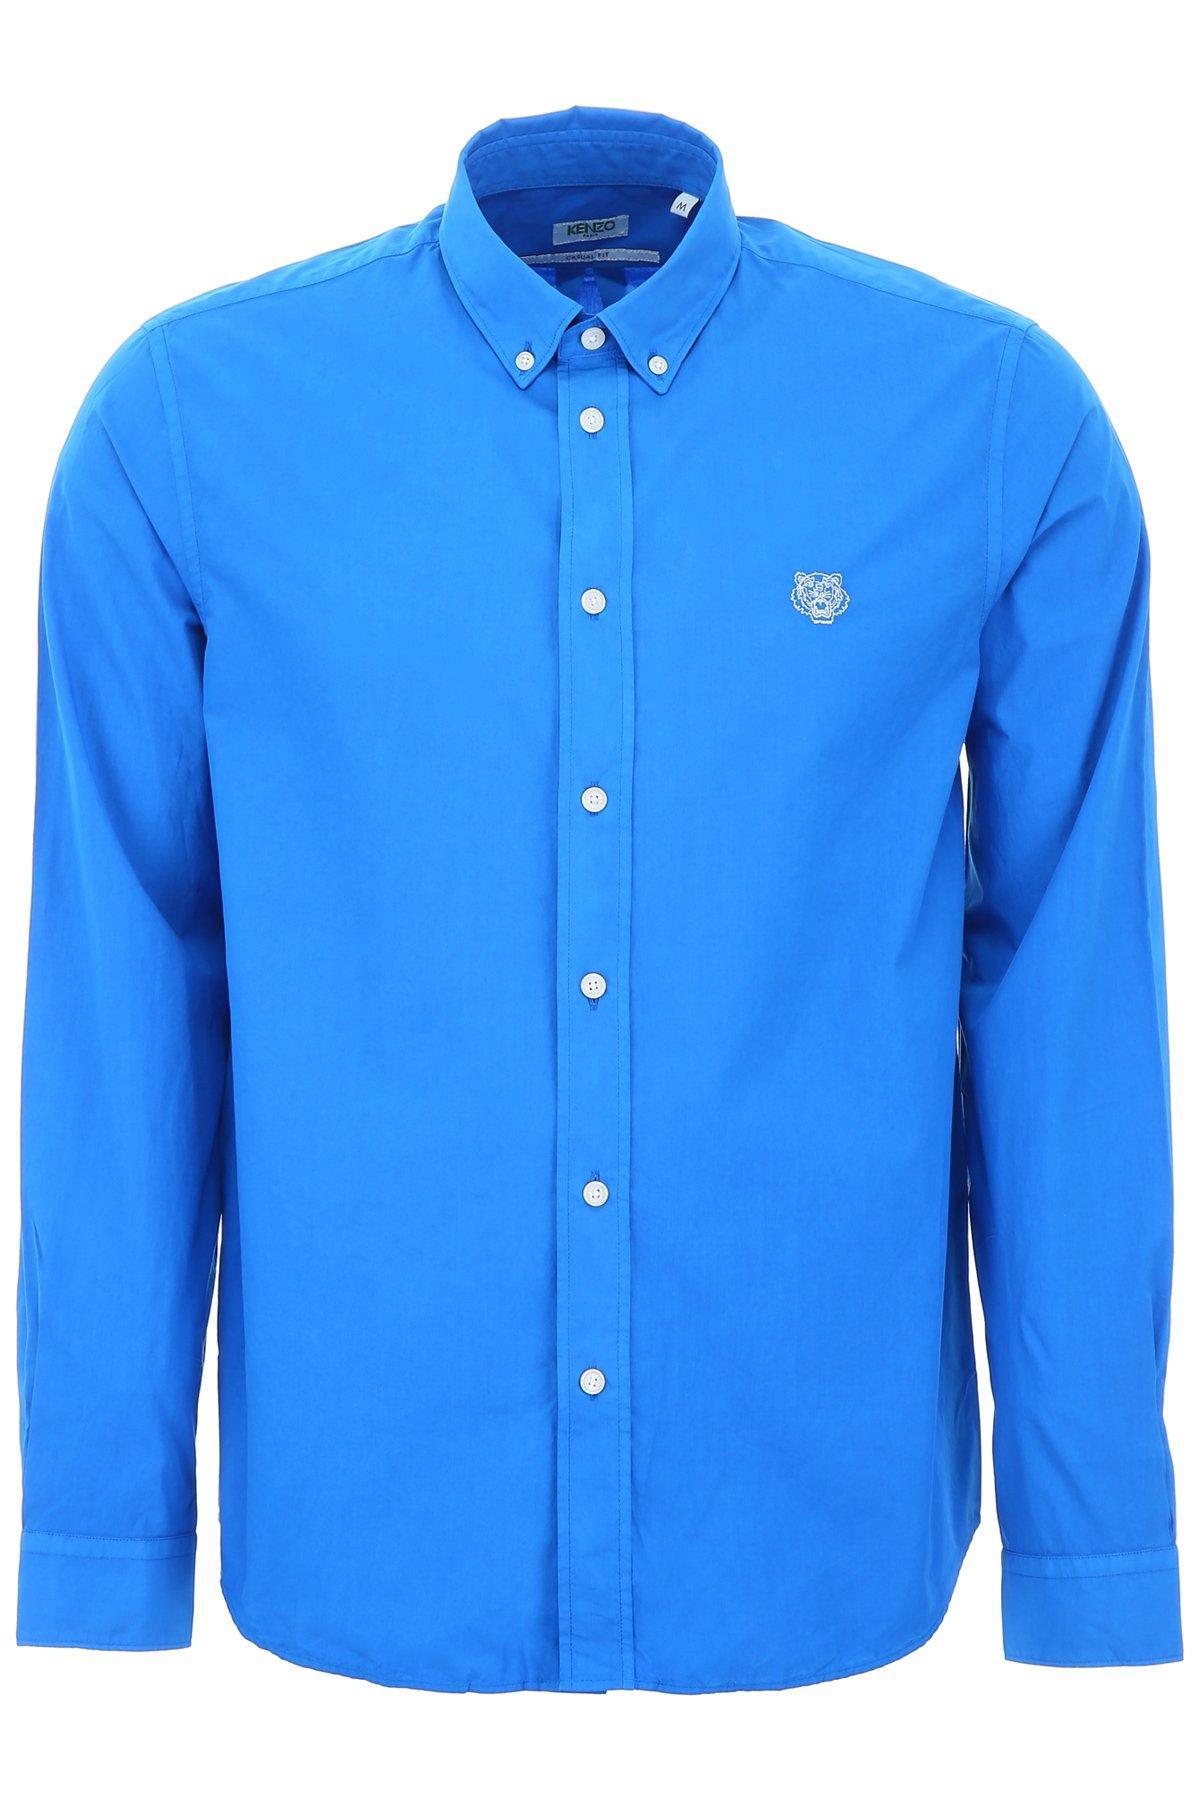 12c35aec KENZO Tiger Detail Shirt in Blue for Men - Lyst